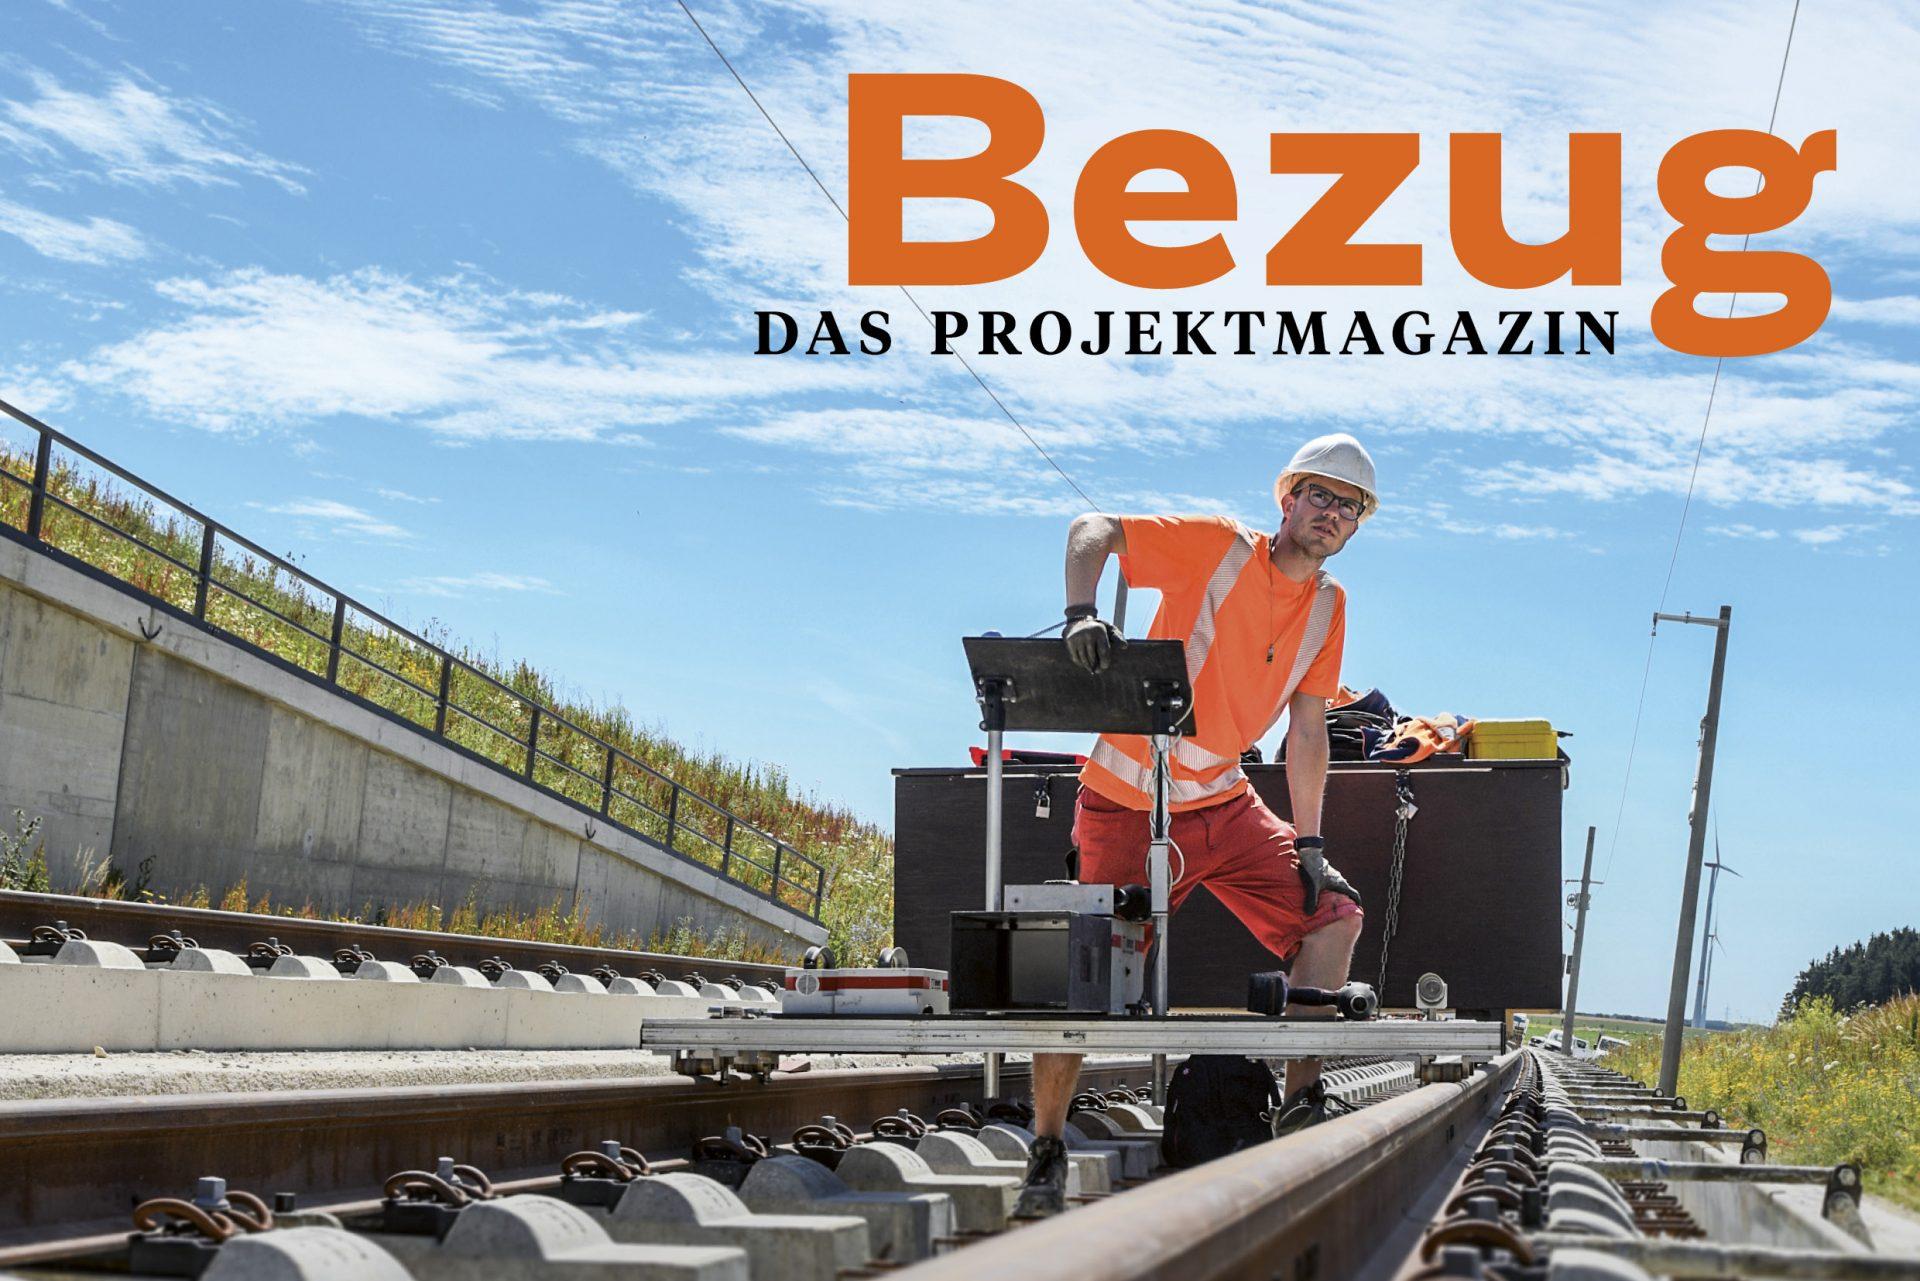 BEZUG 29 - Aktuelle Ausgabe